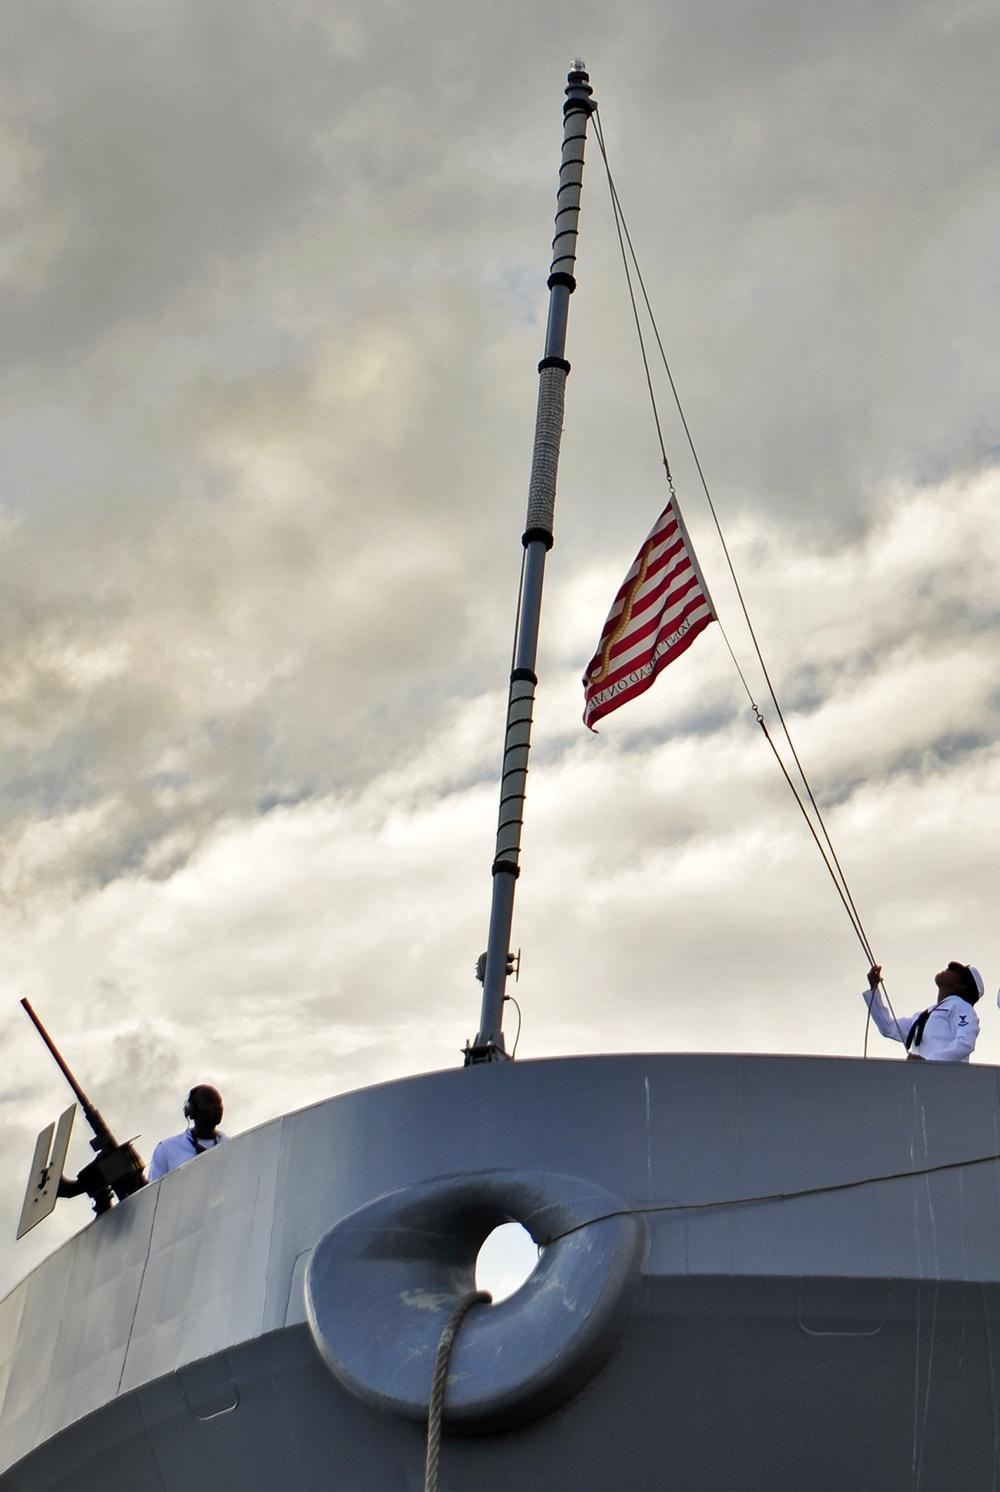 Joint Base Pearl Harbor-Hickam